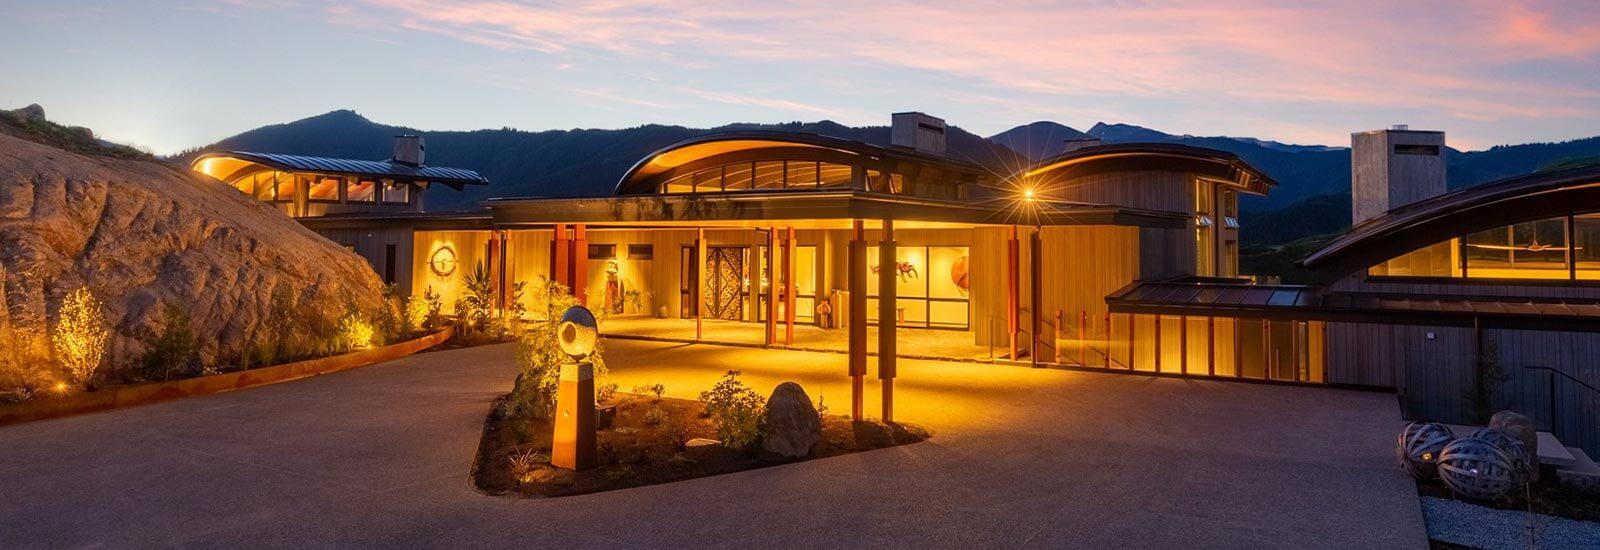 unique accommodation New Zealand